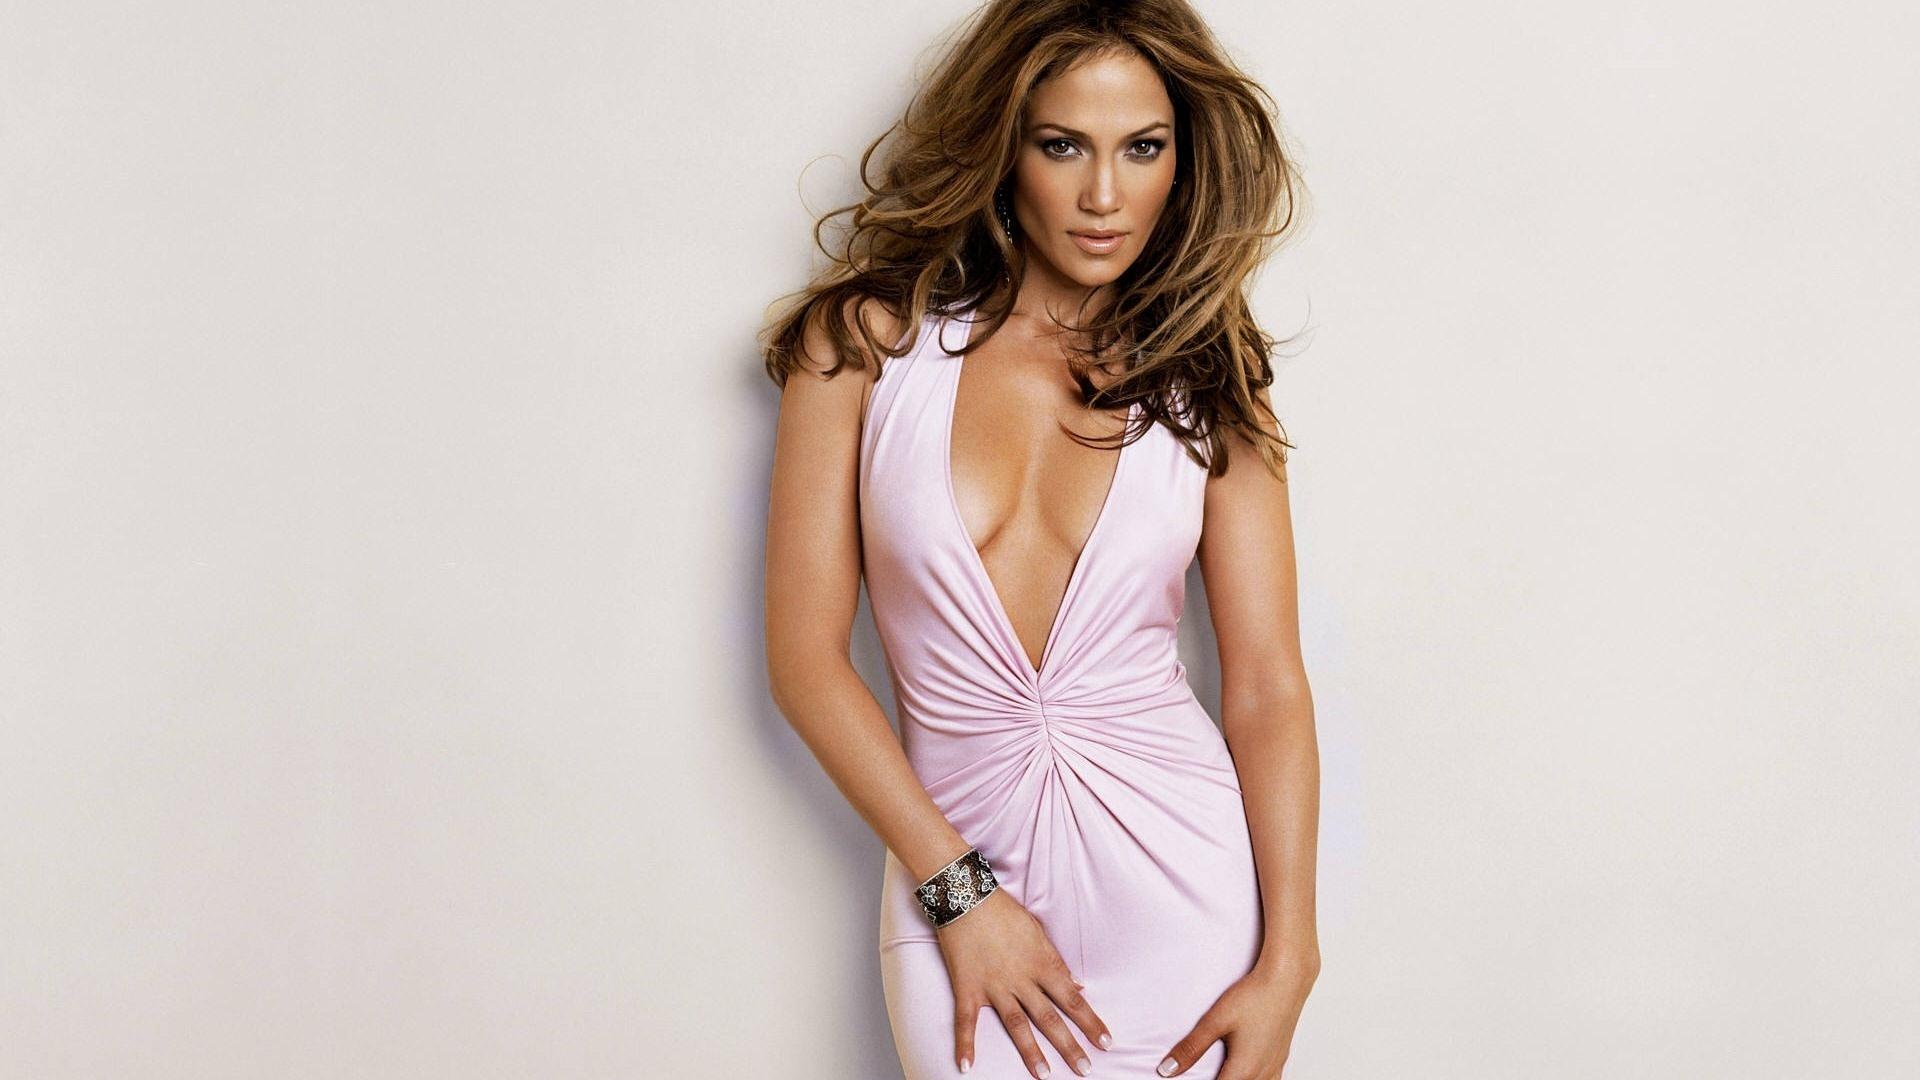 Jennifer Lopez Hd Wallpaper